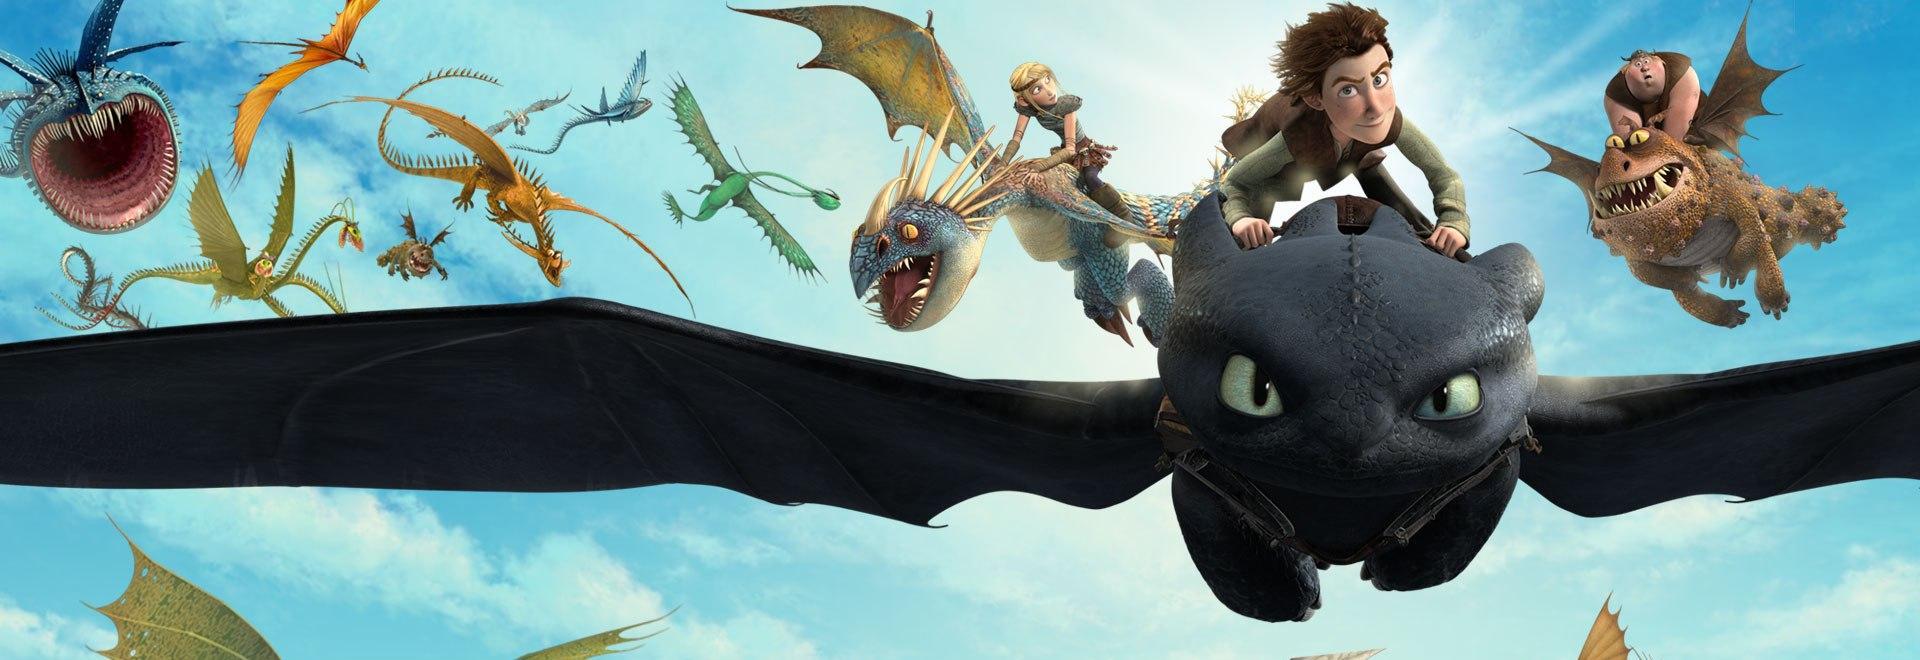 Dragons: I cavalieri di Berk